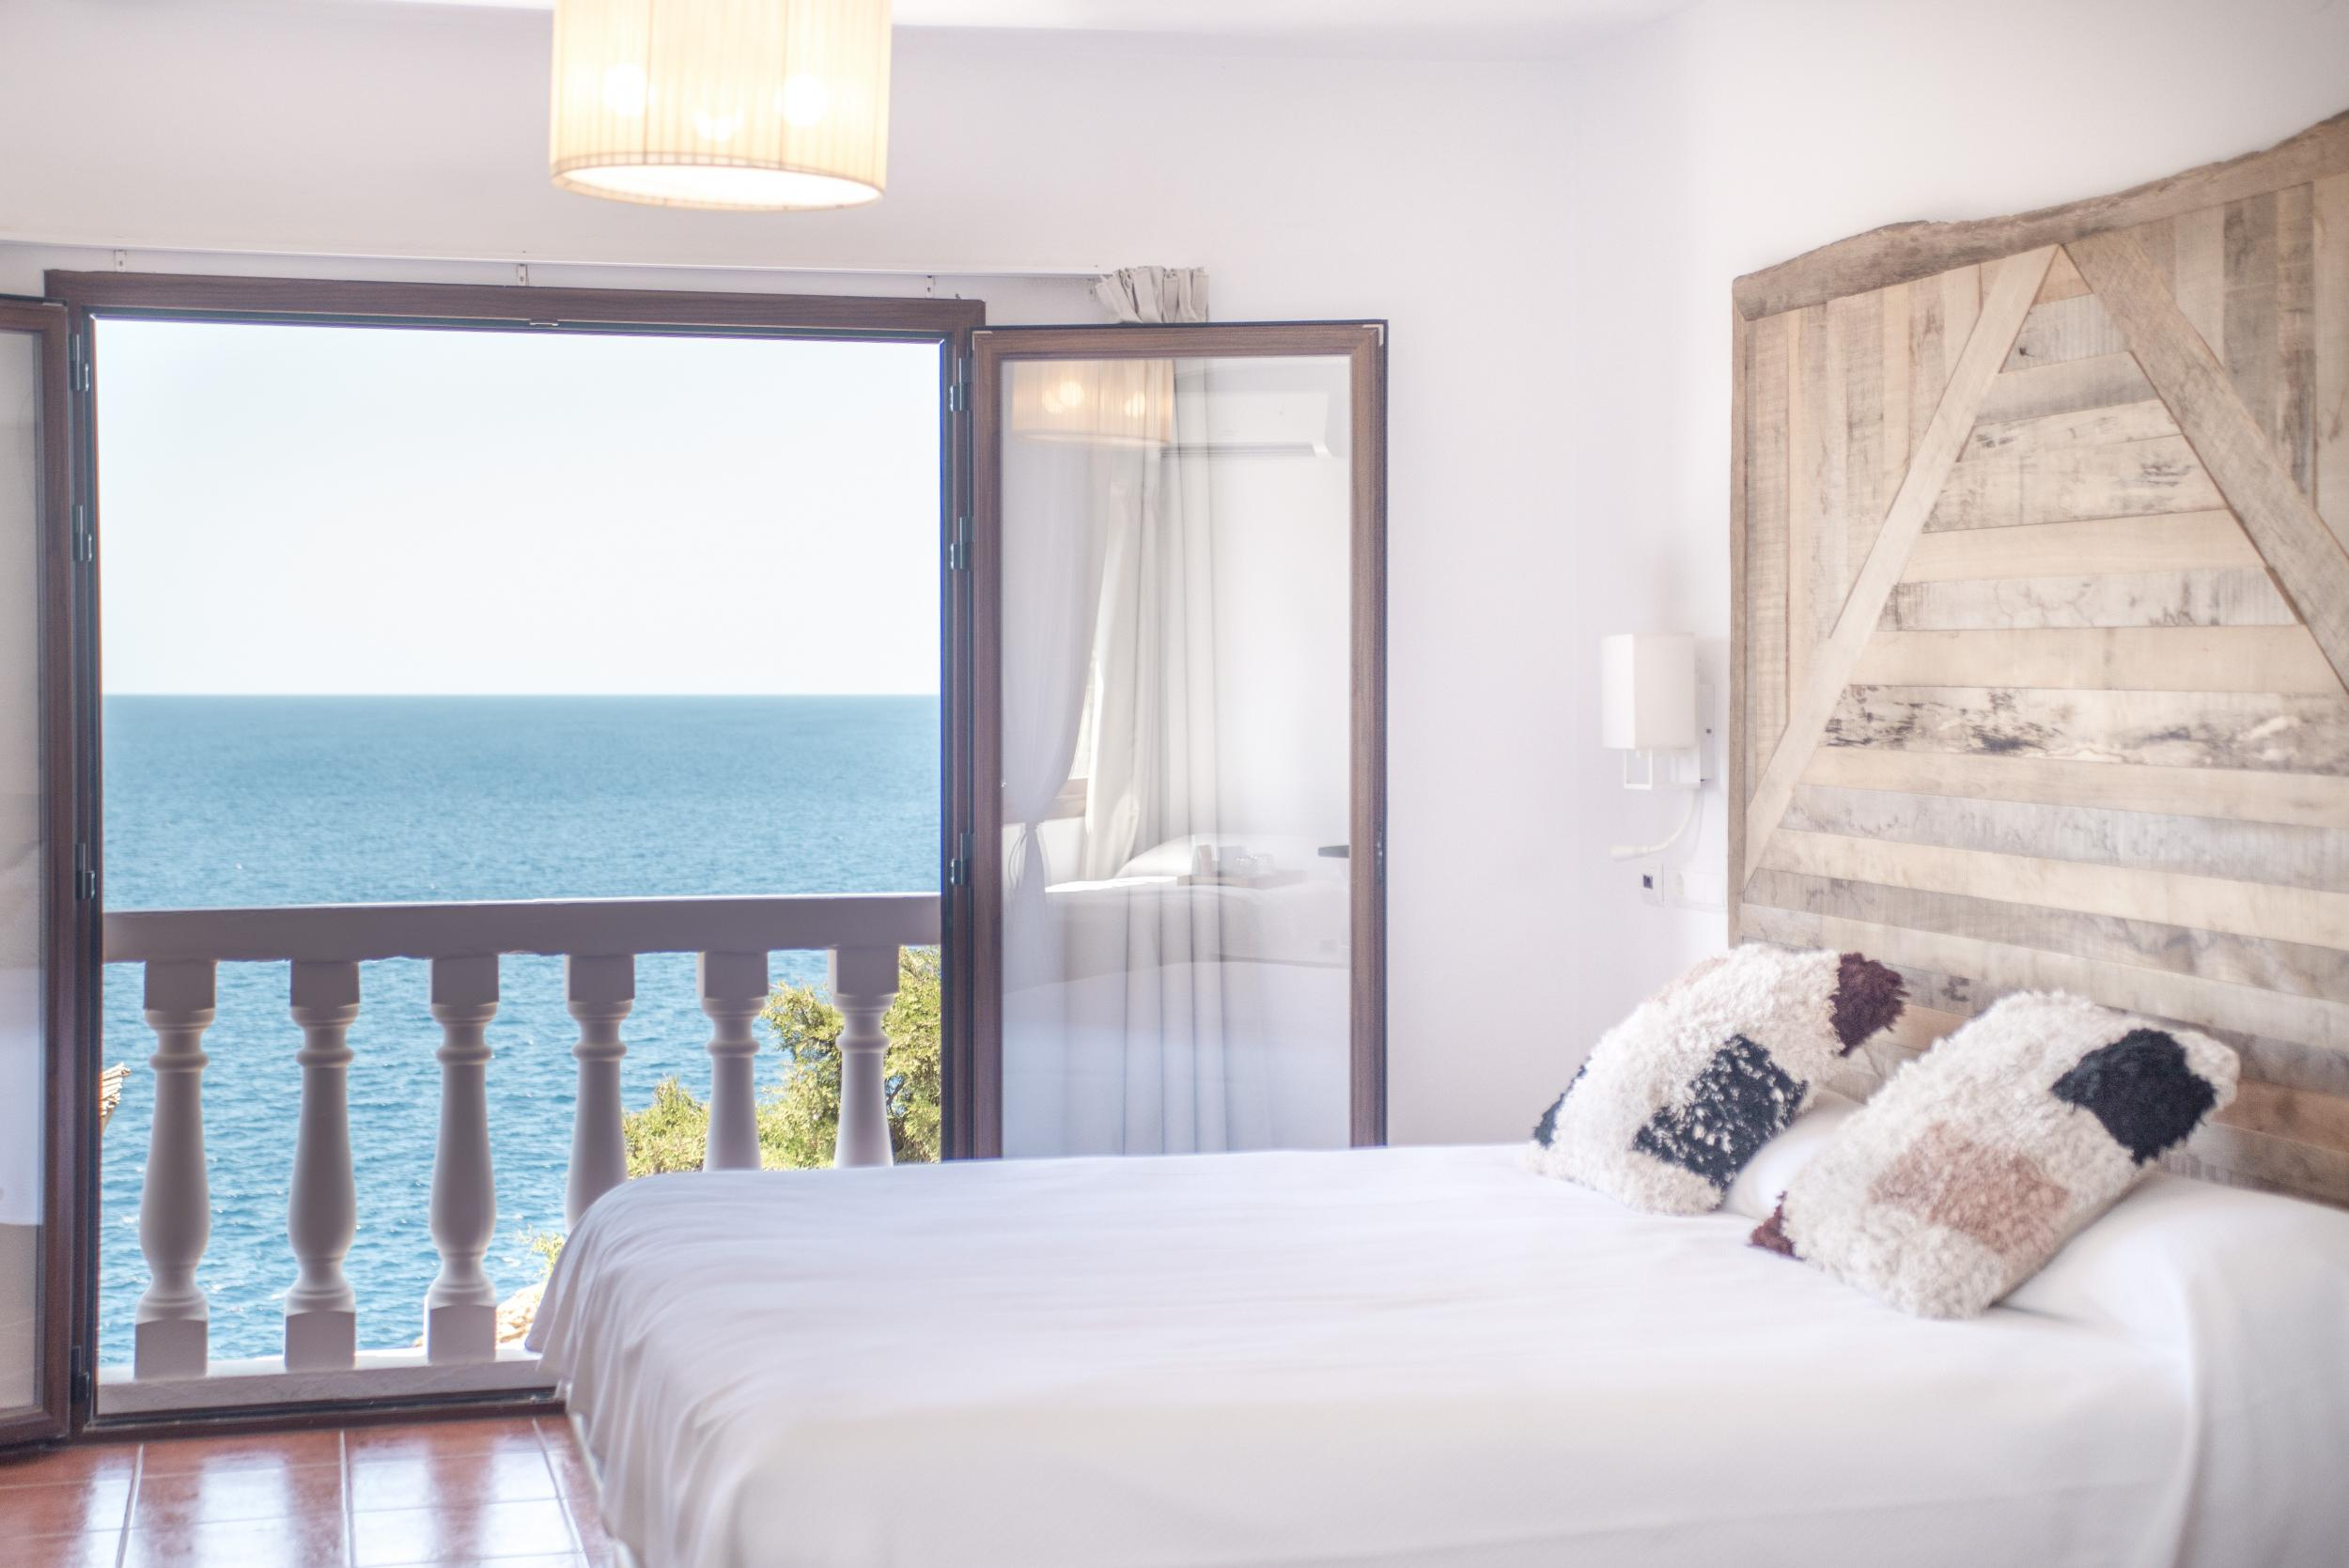 e1a12ae101a0 Top 10 Hotels in Ibiza - Arabia Day